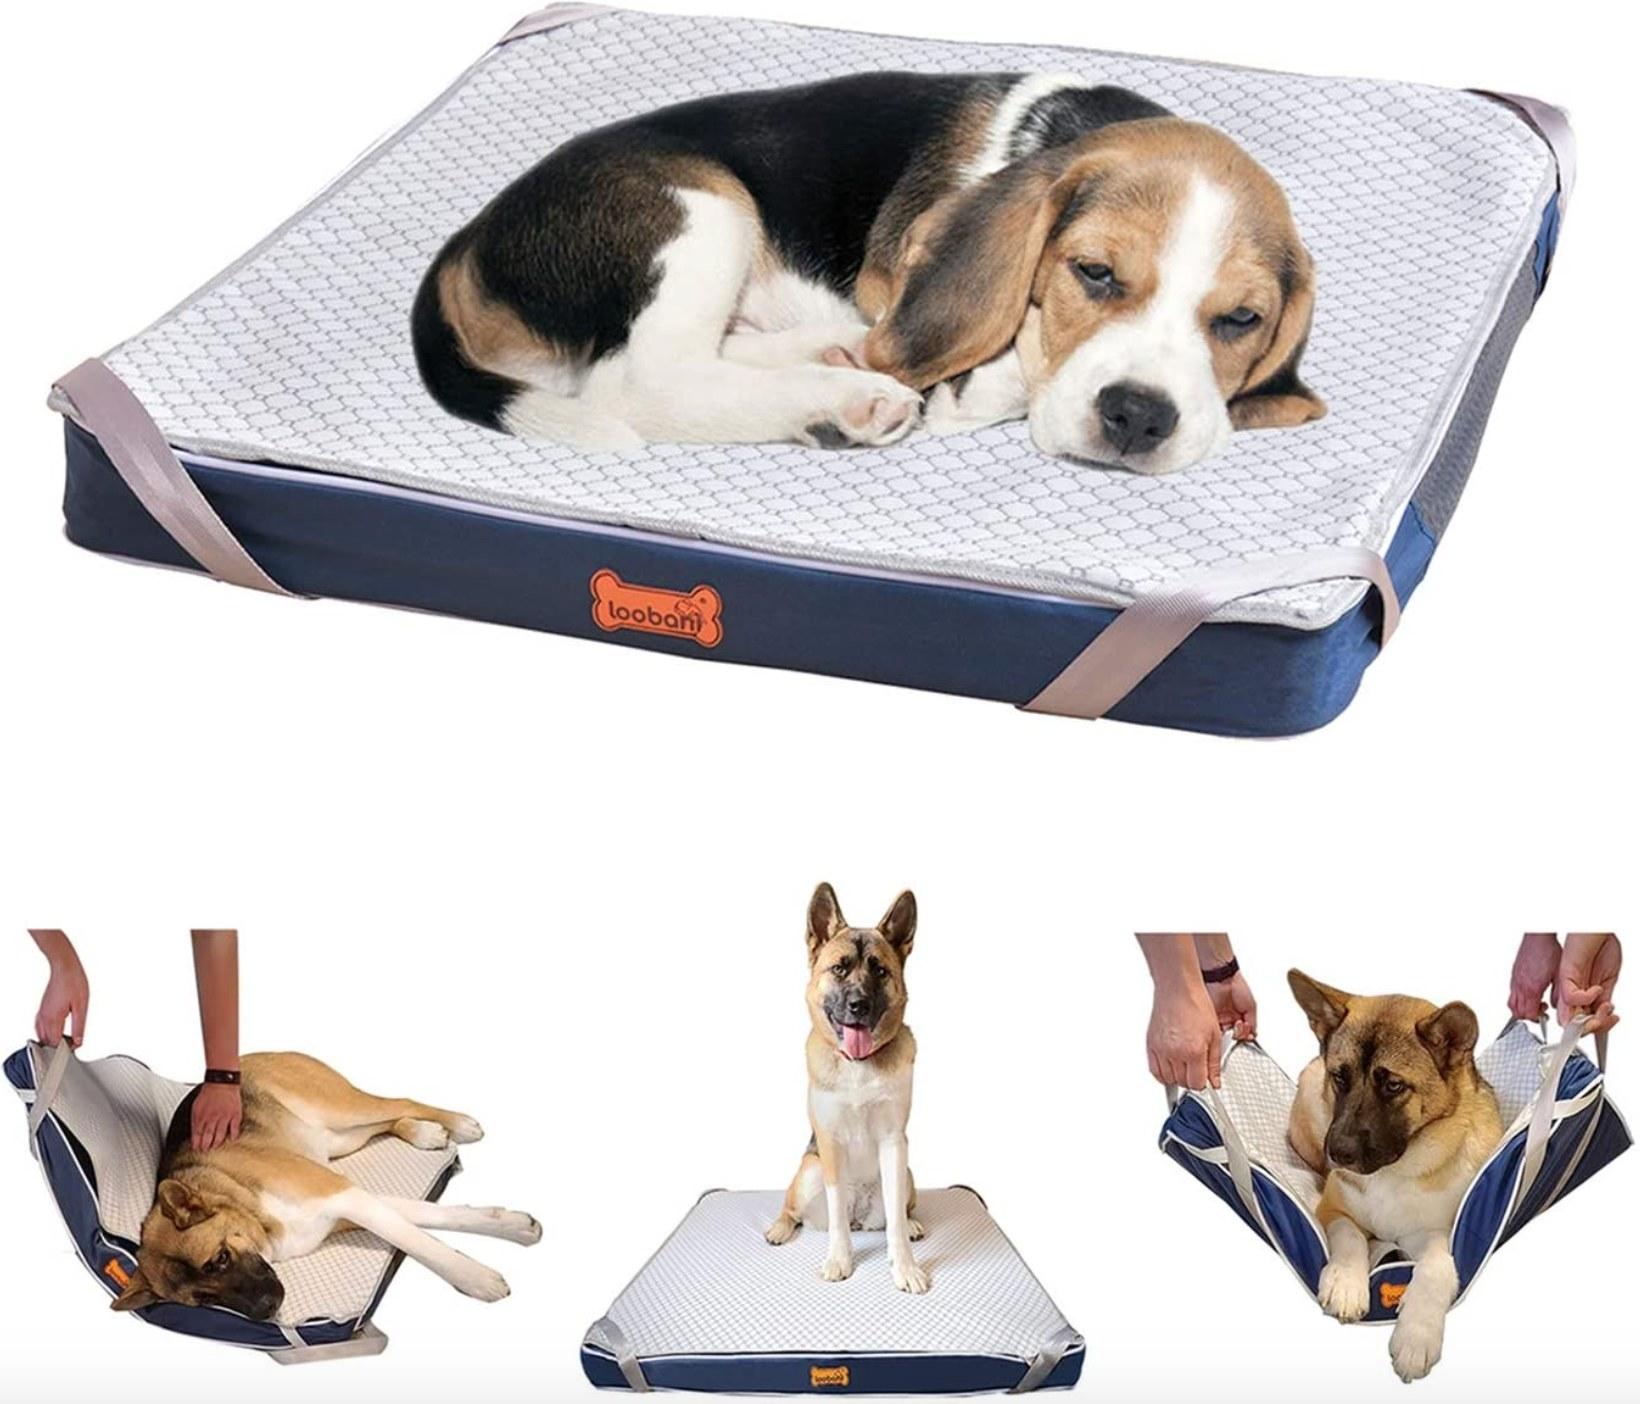 The orthopedic dog bed